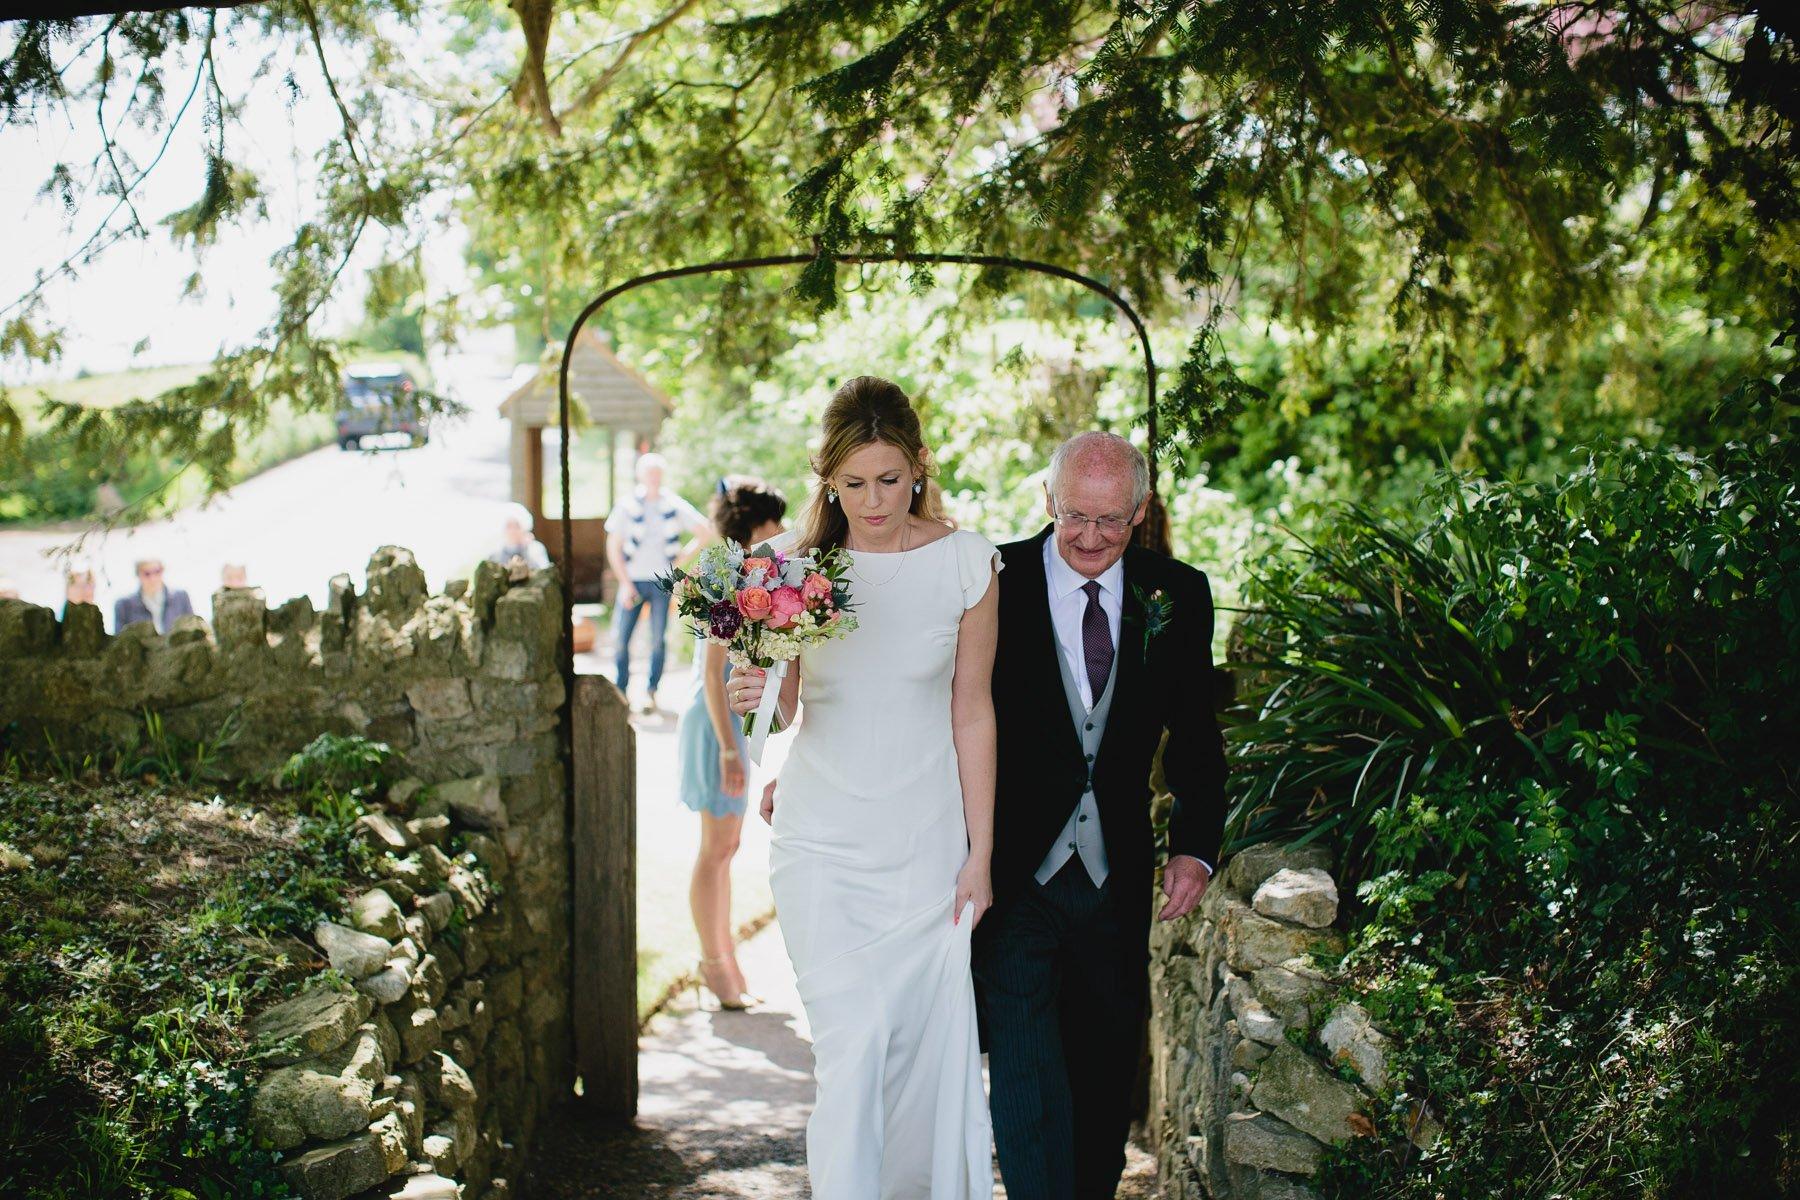 Buckinghamshire-Wedding-Lizzie-Duncan-058